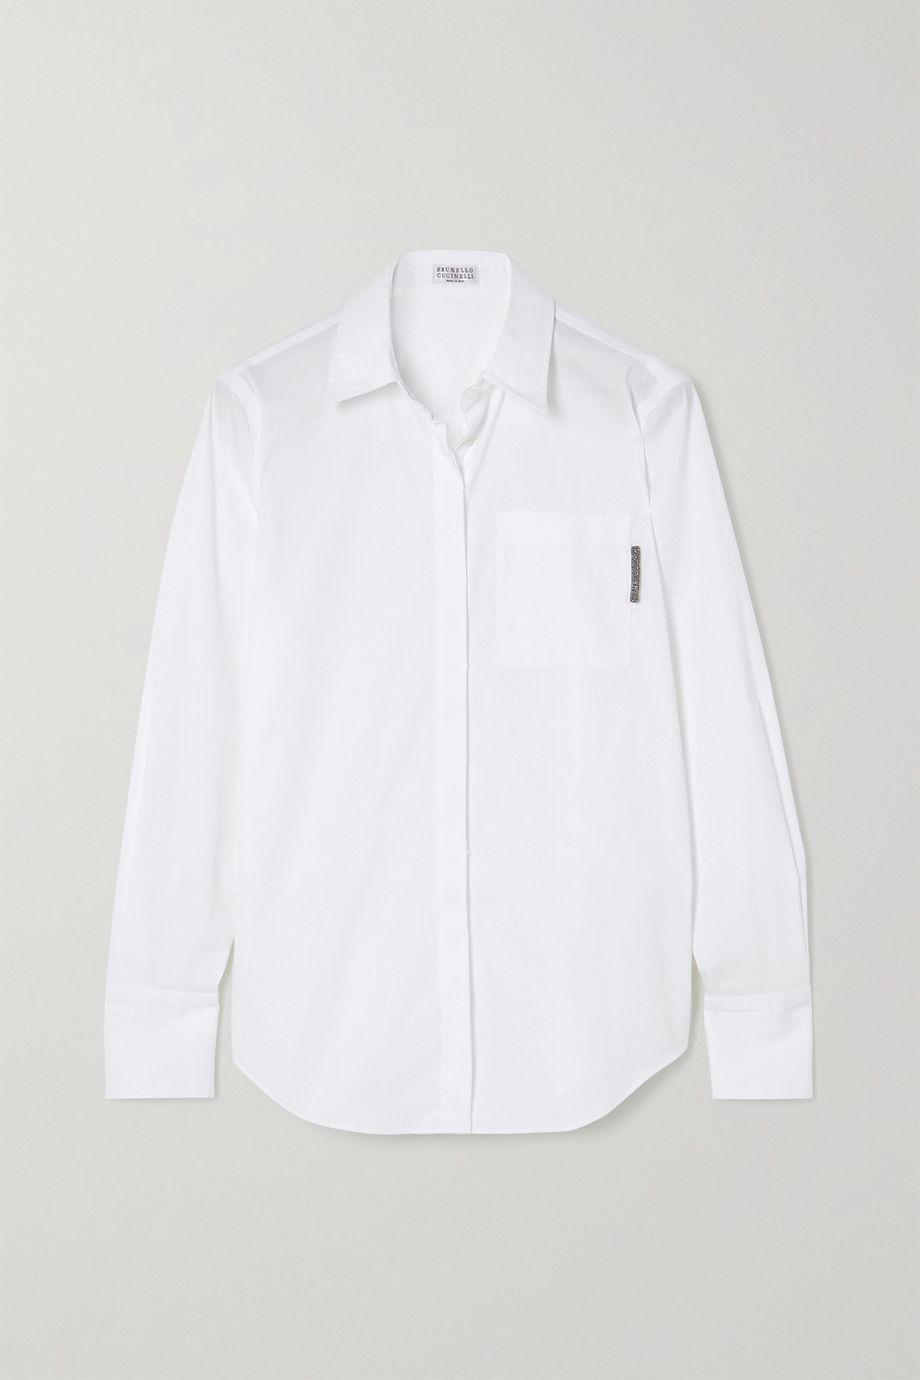 Brunello Cucinelli Bead-embellished cotton-blend Oxford shirt